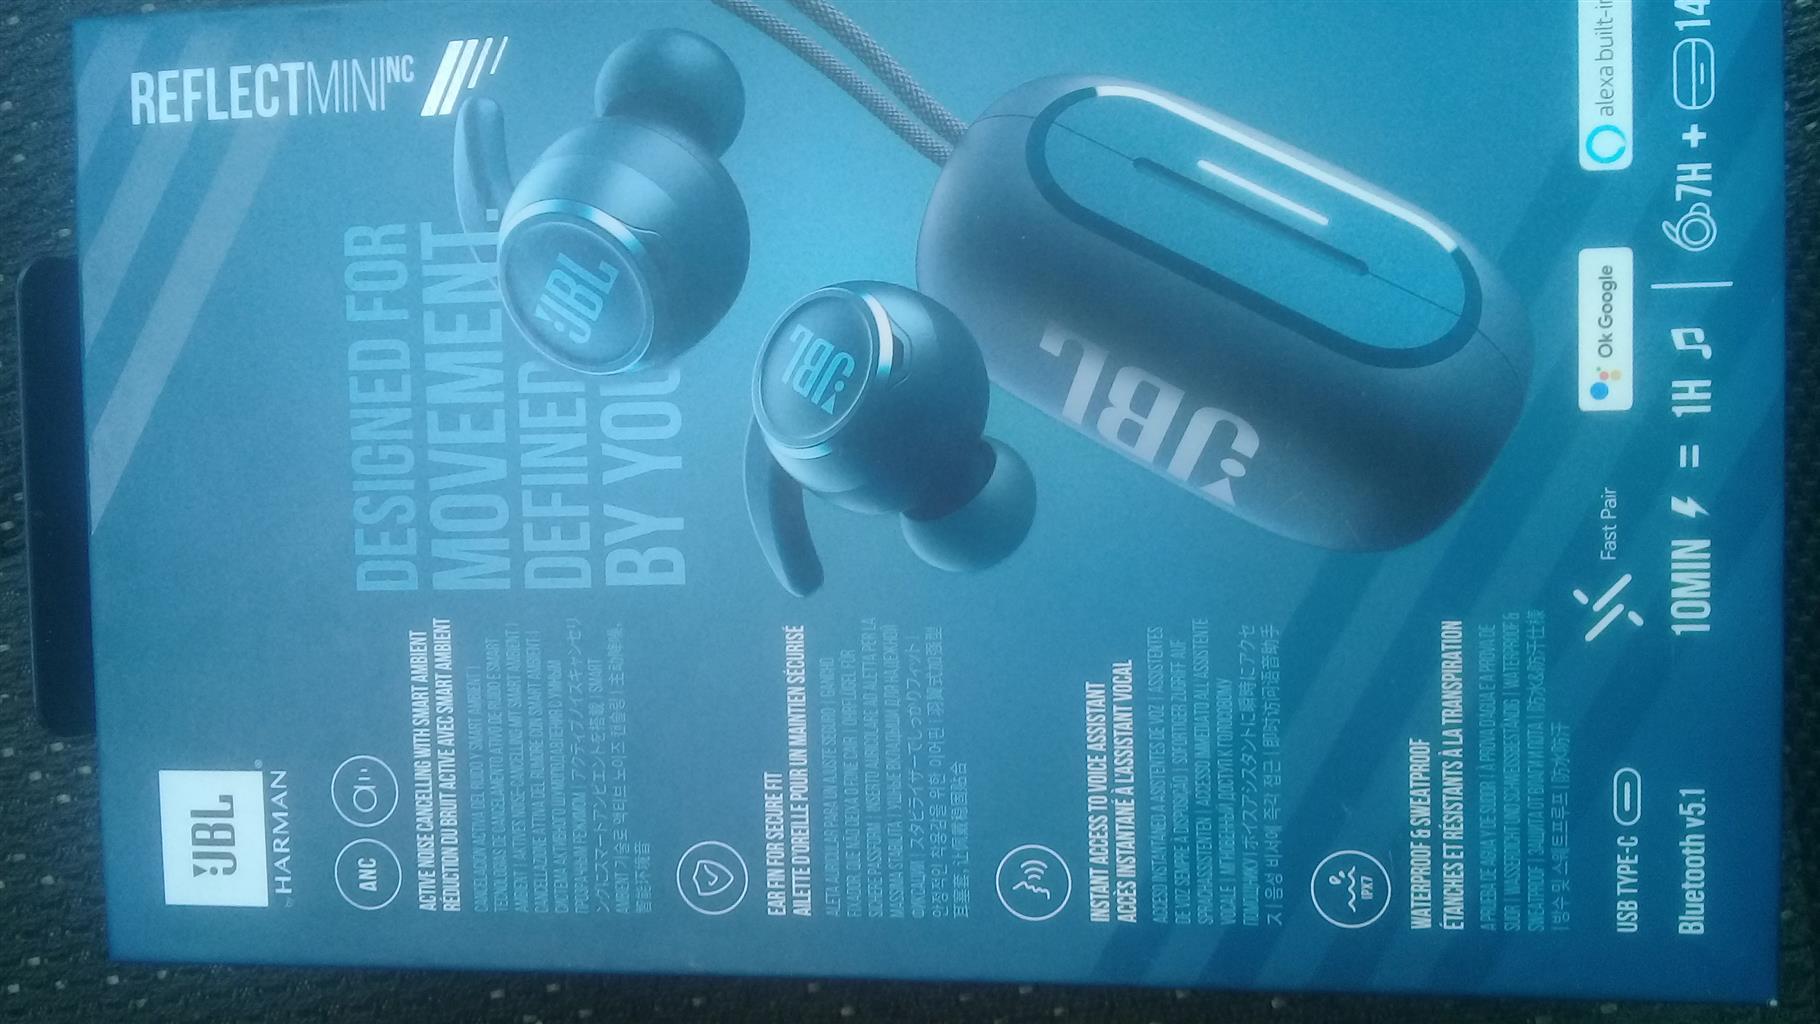 JBL REFLECTIVE MINI BLUTOOTH WATERPROOF EARBUDS